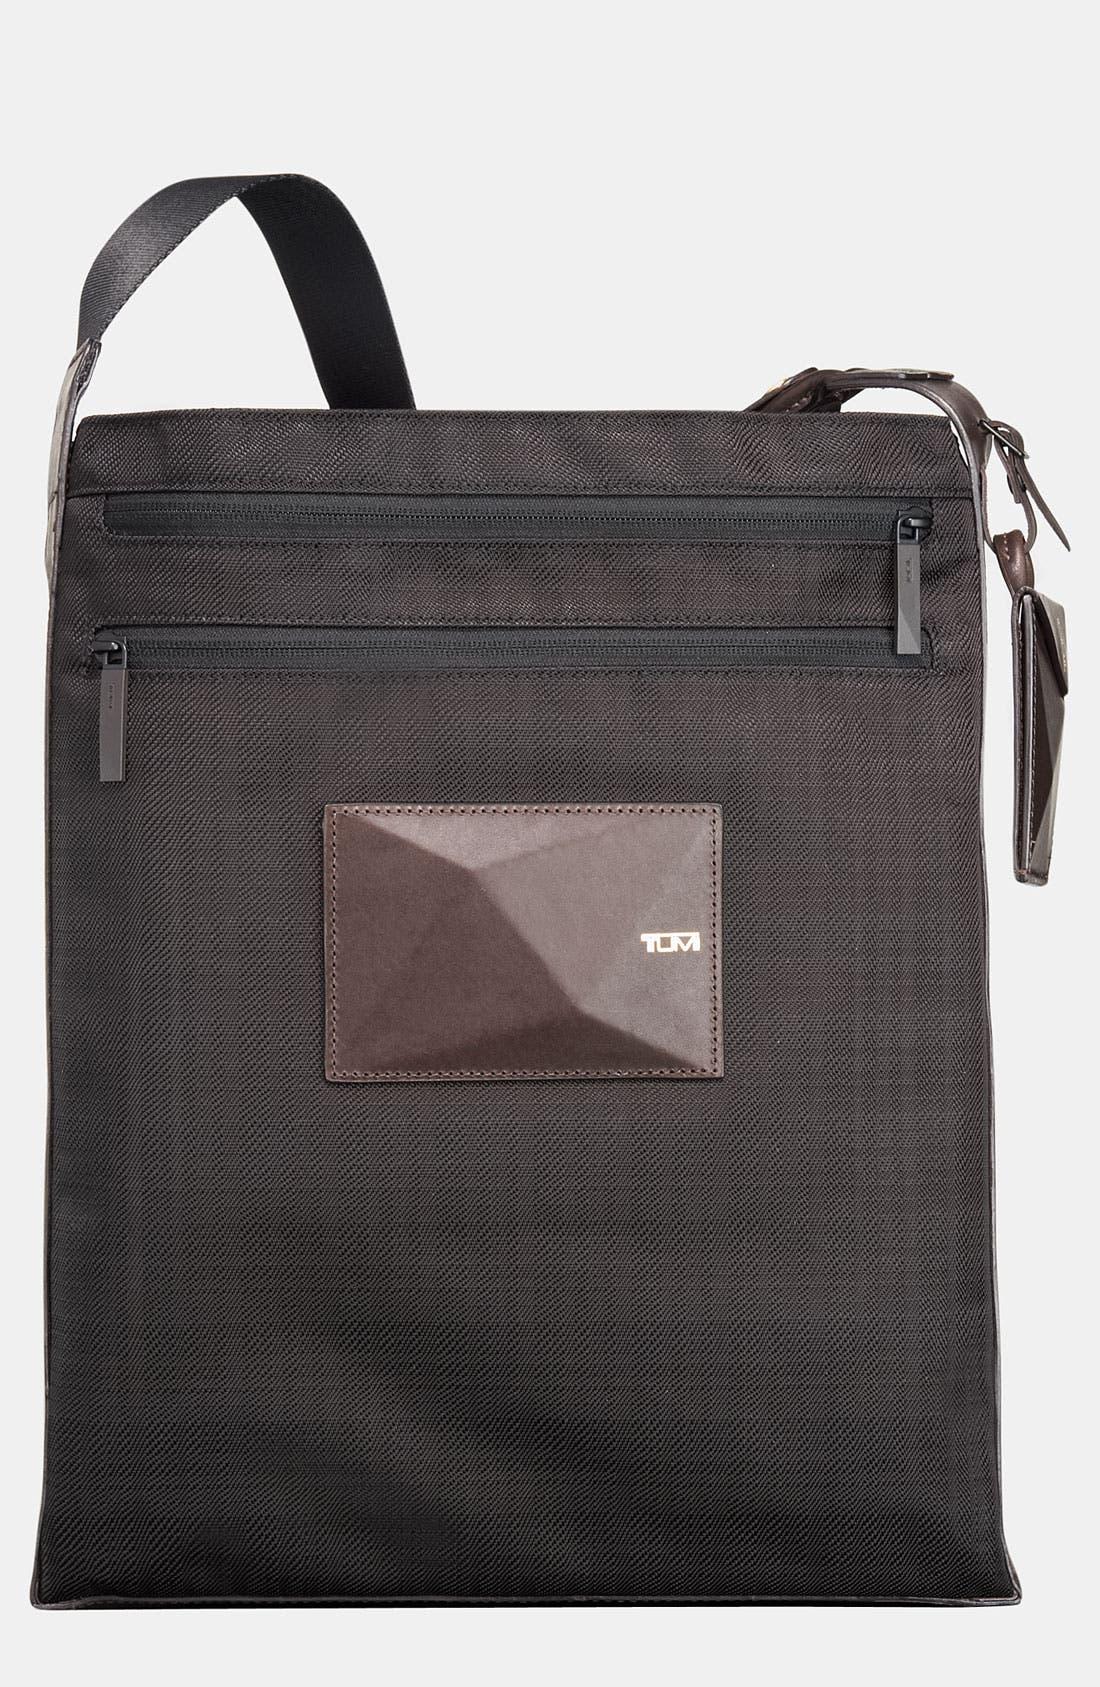 Alternate Image 1 Selected - Tumi 'Dror' Large Crossbody Bag